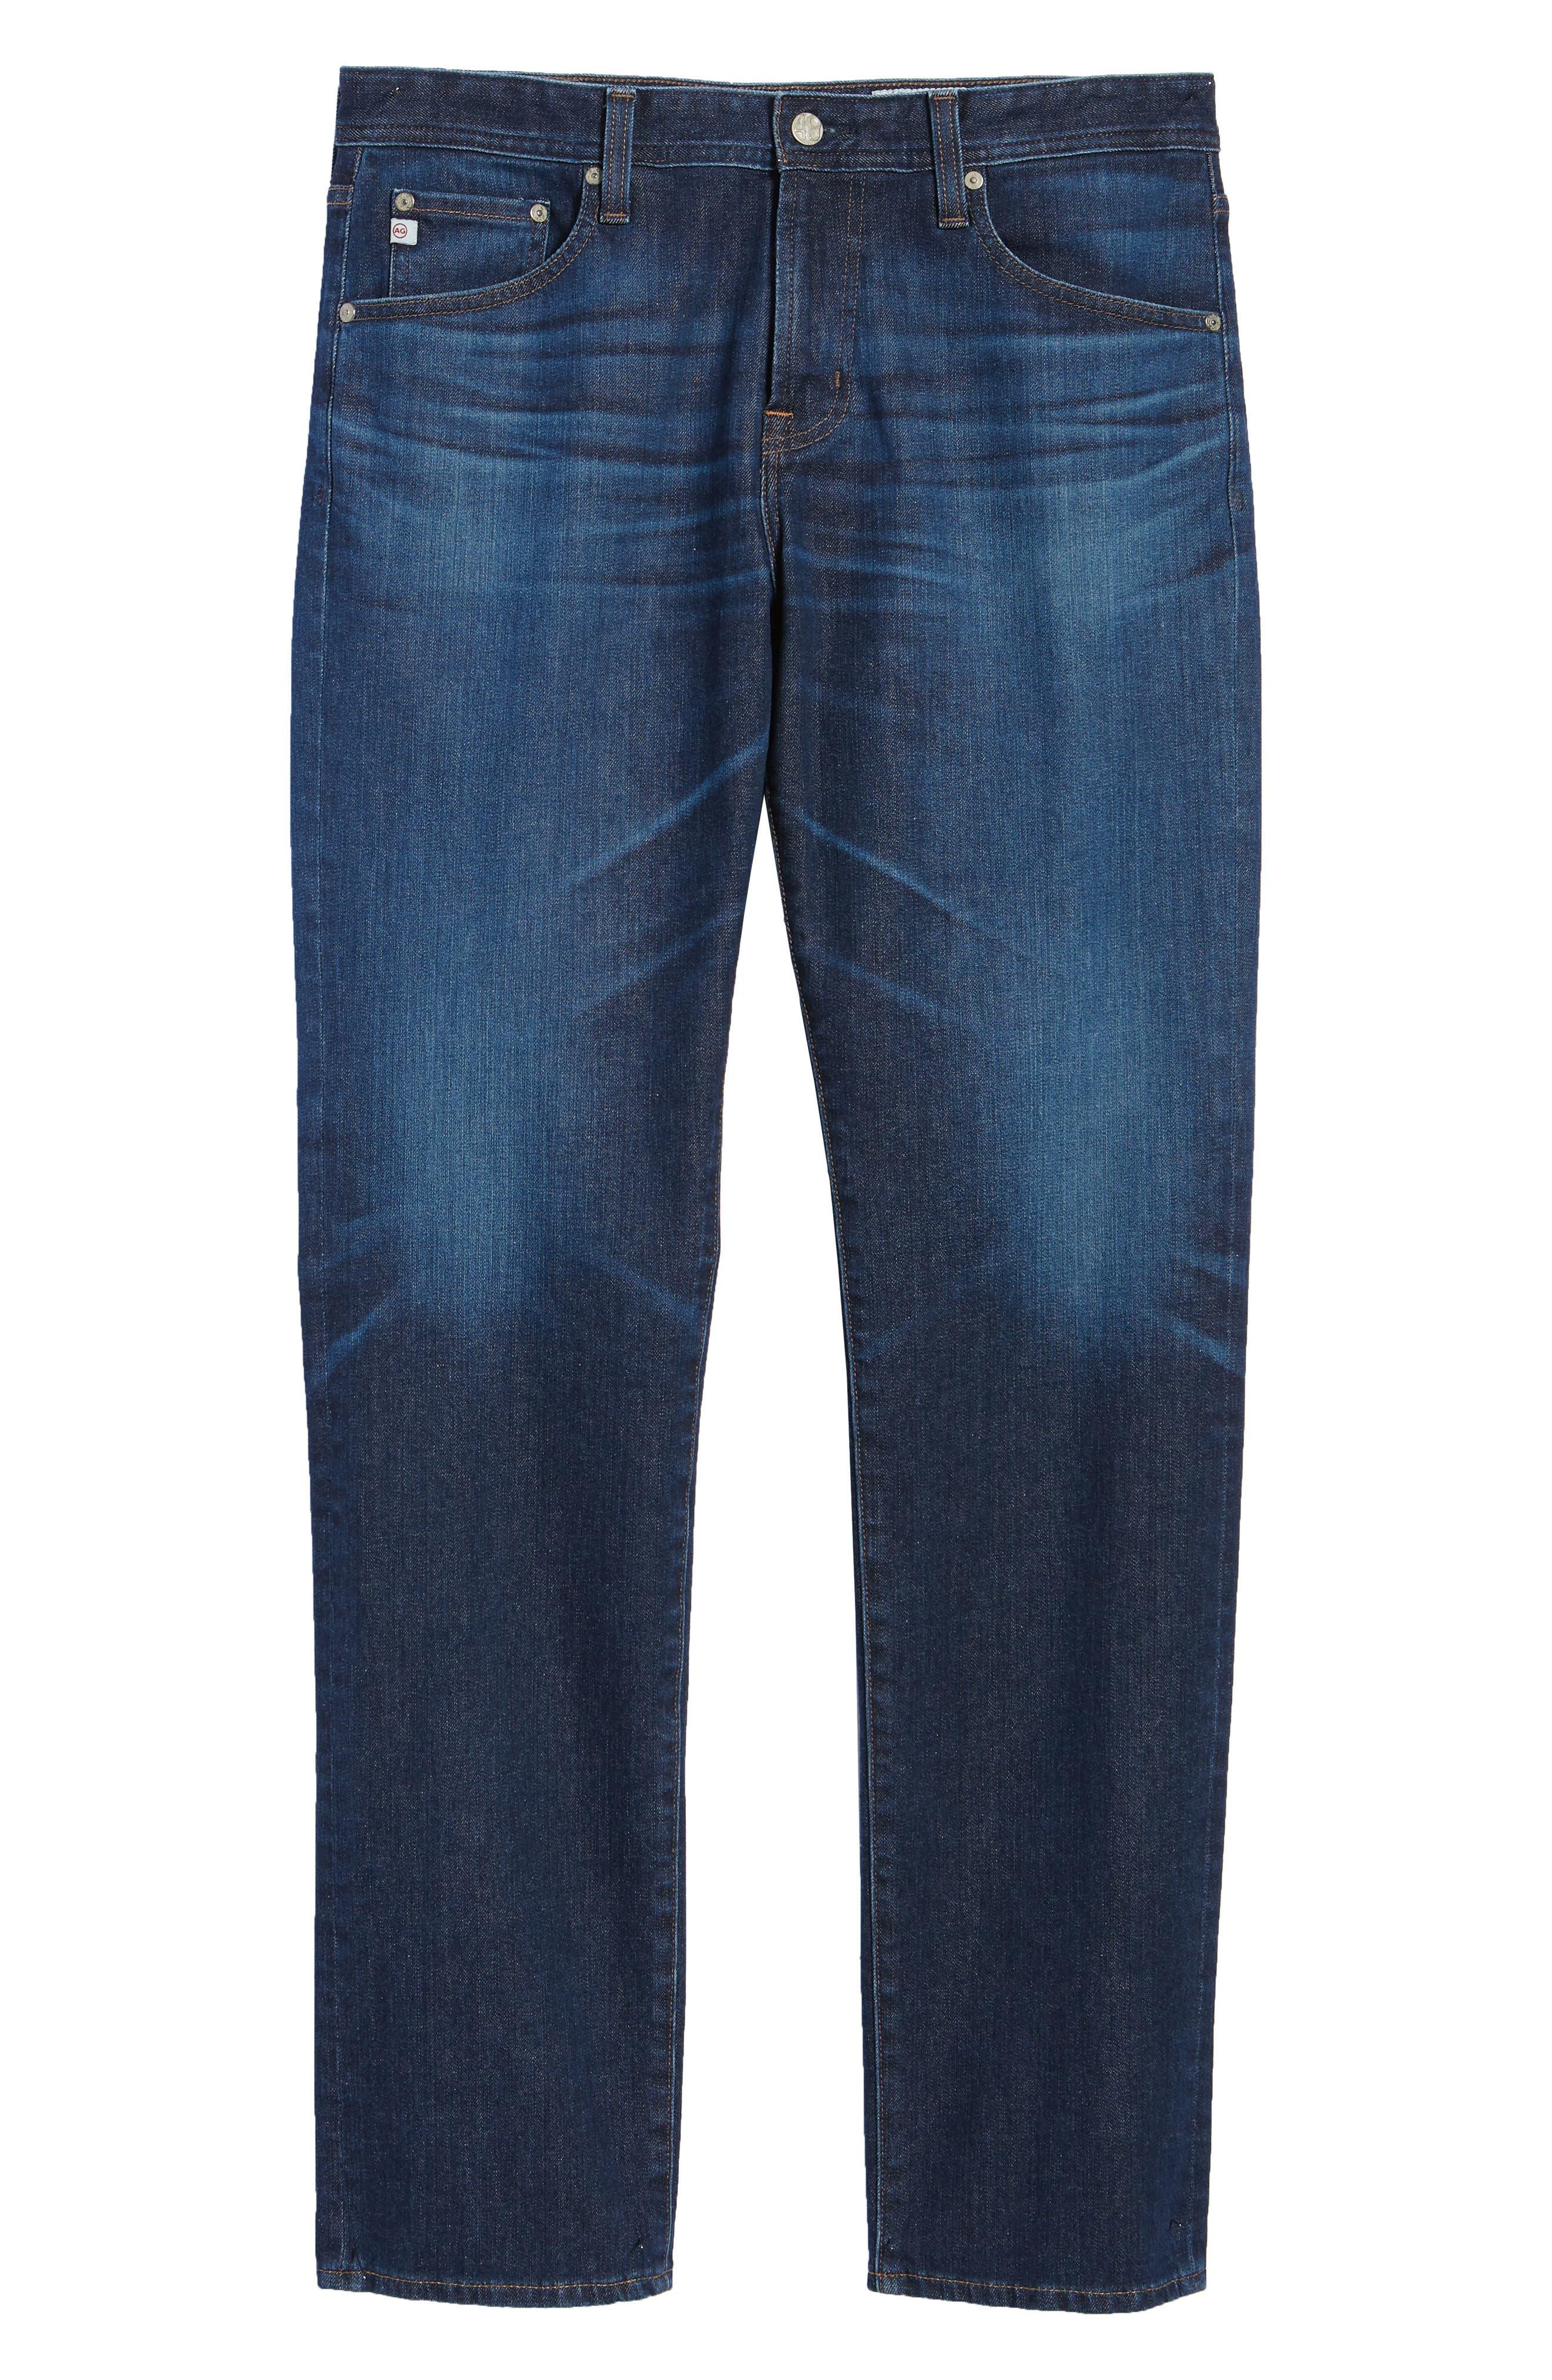 Graduate Slim Straight Fit Jeans,                             Alternate thumbnail 6, color,                             5 YEARS LOST COAST